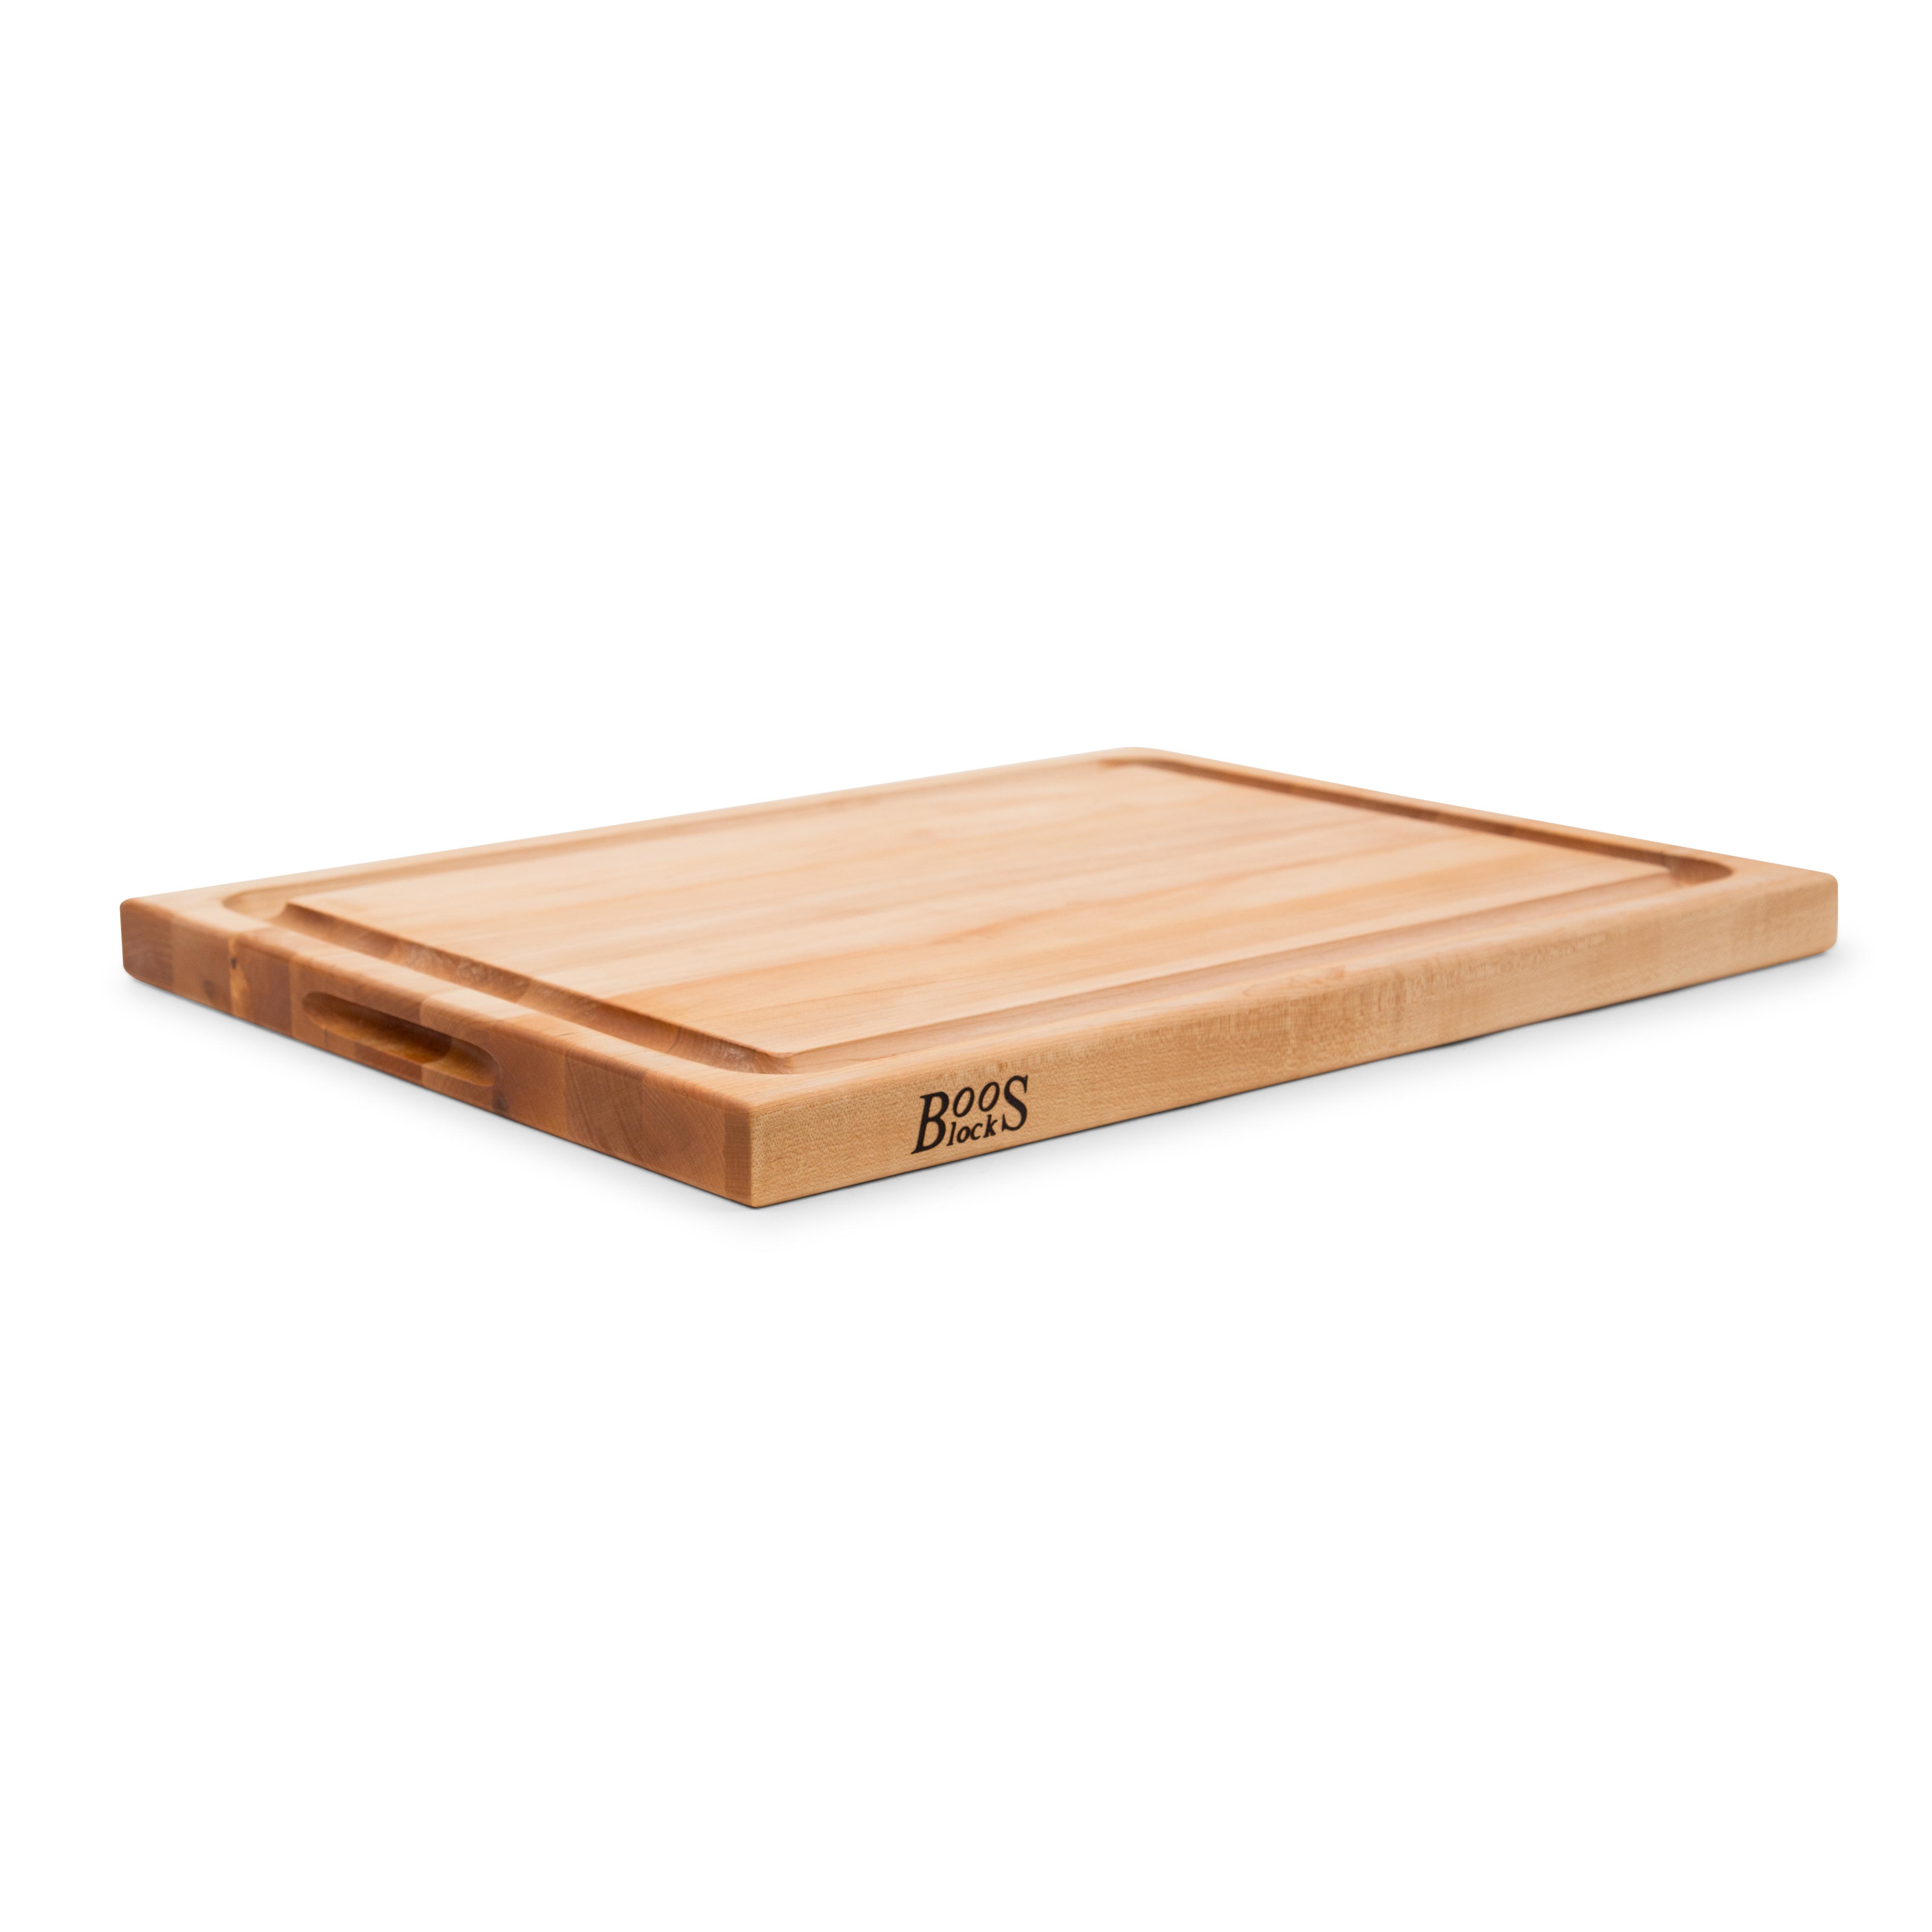 John Boos CB1054-1M2015150 cutting board, wood